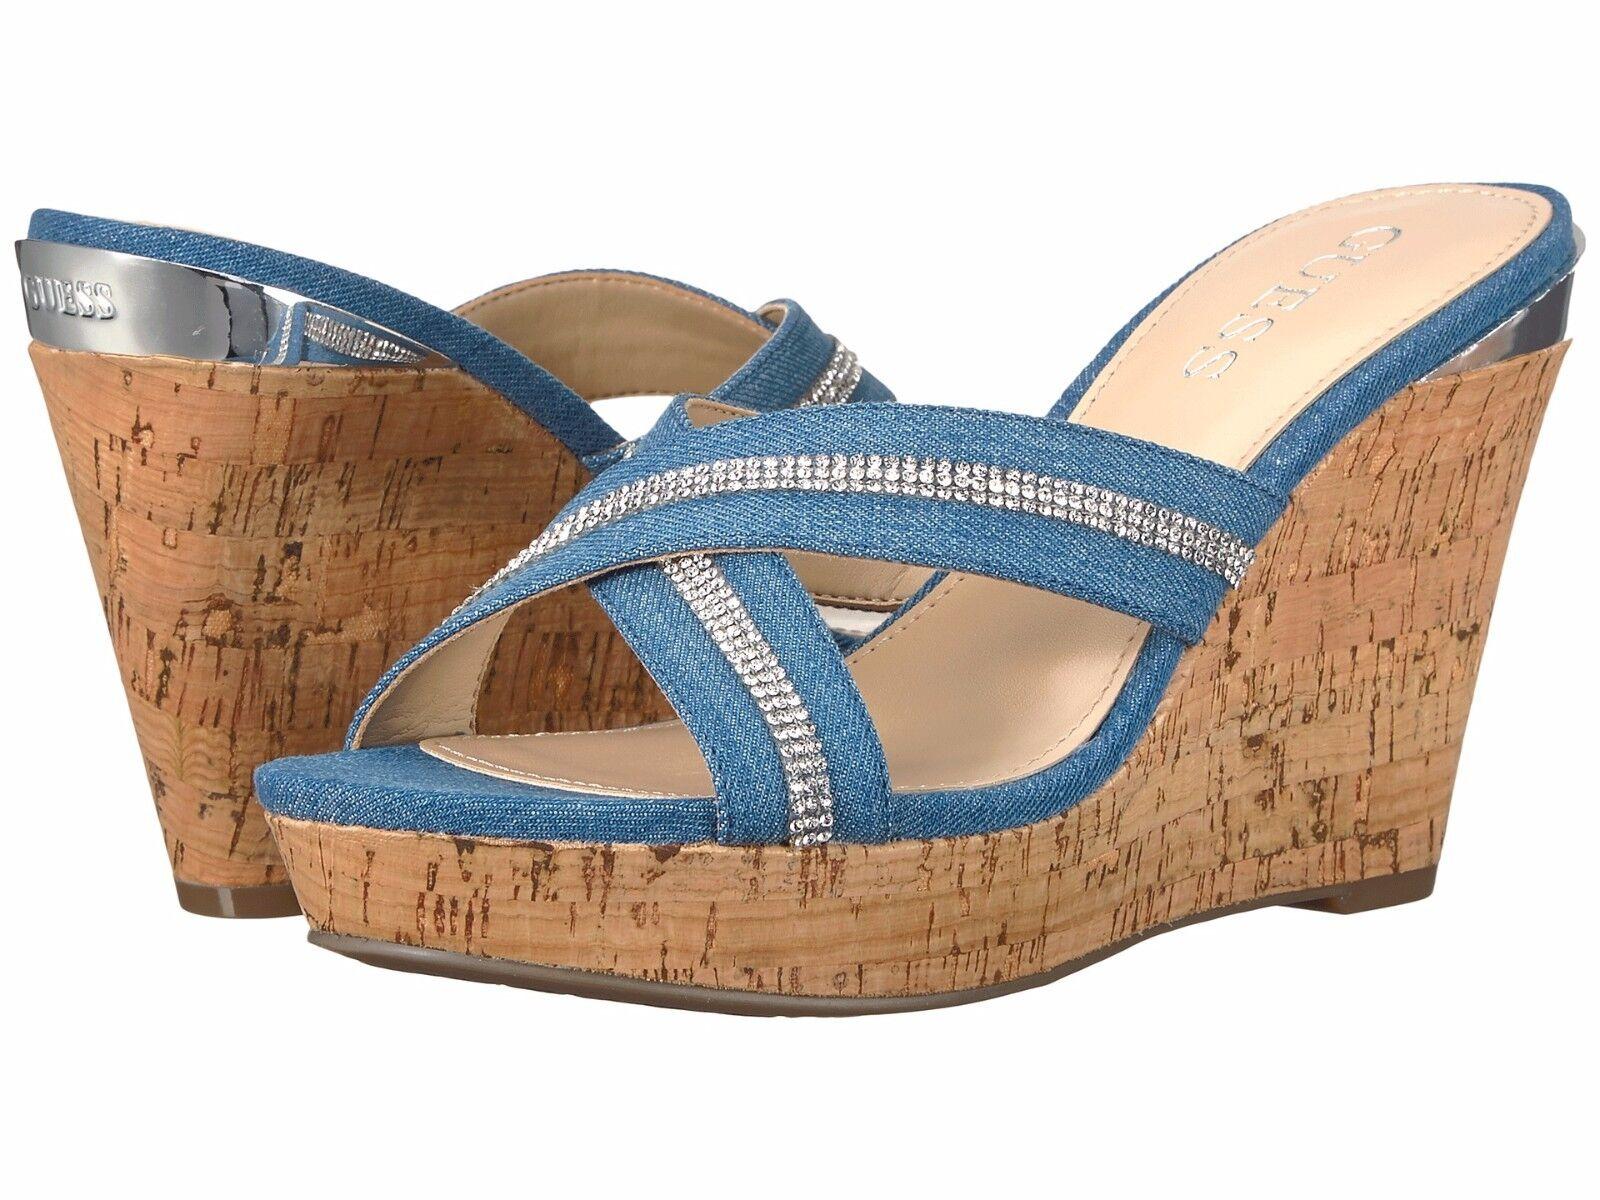 GUESS Eieny Medium Blue Criss-Cross Denim Fabric Criss-Cross Blue Rhinestone Cork Wedge Shoes 866683